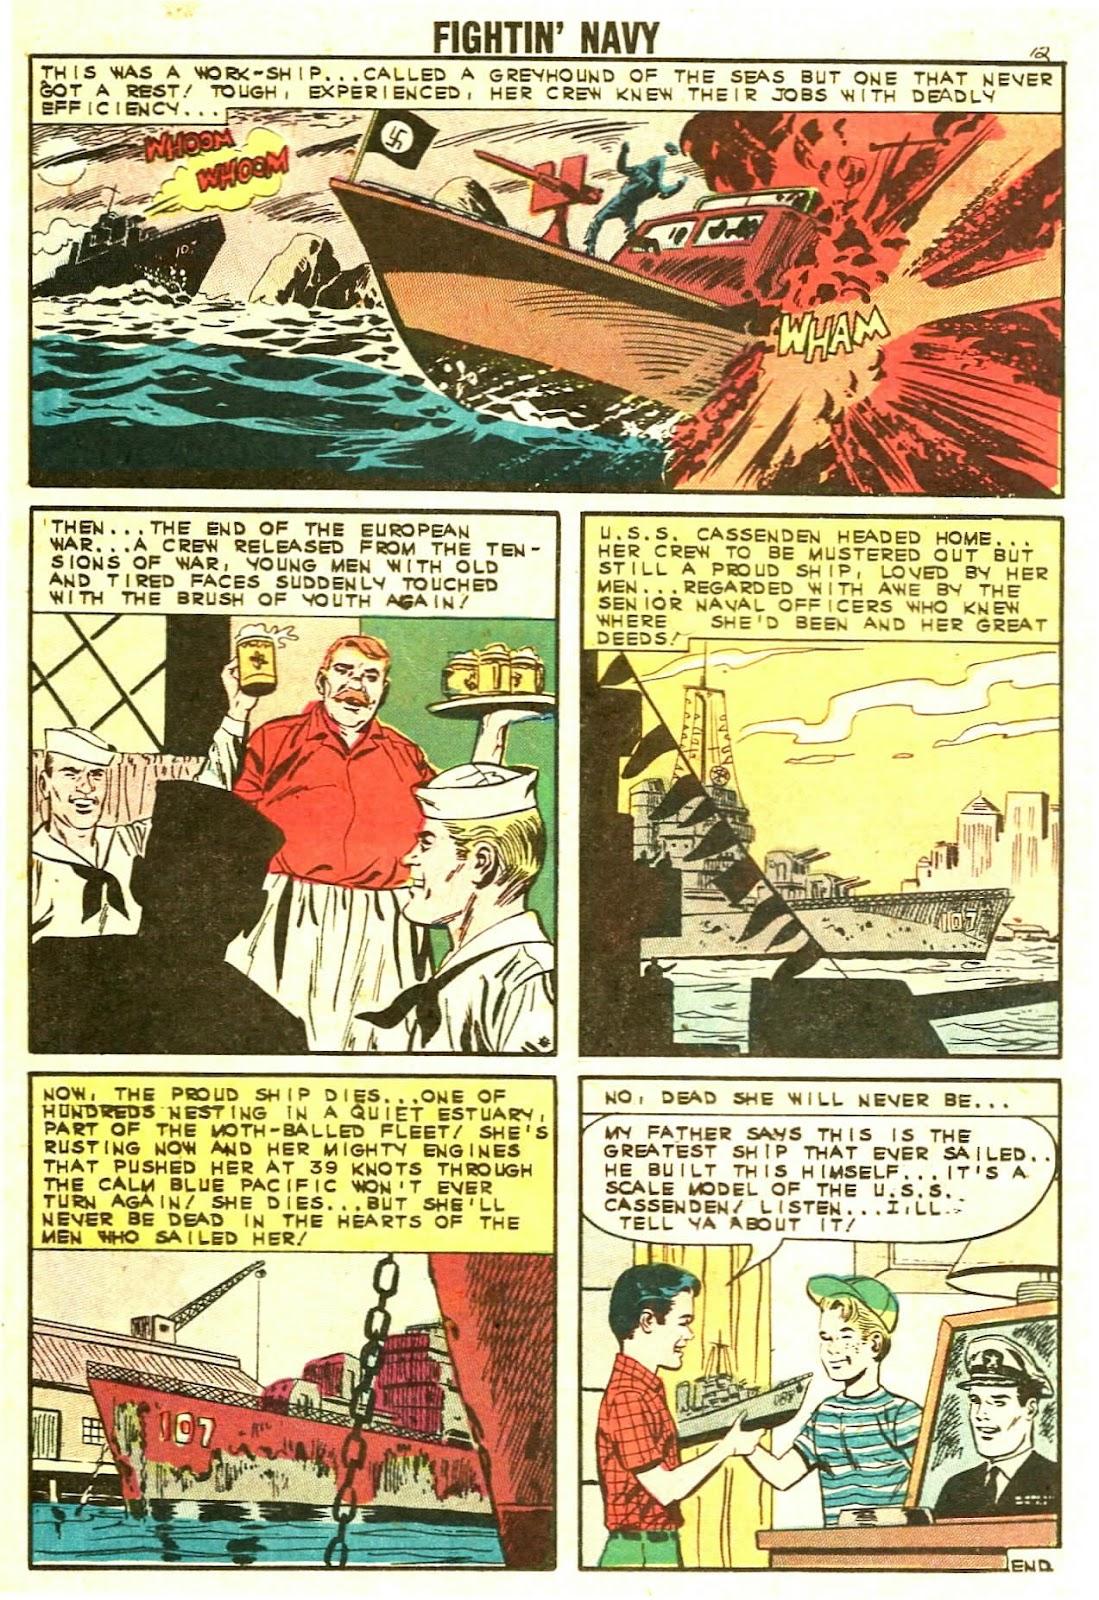 Read online Fightin' Navy comic -  Issue #110 - 14